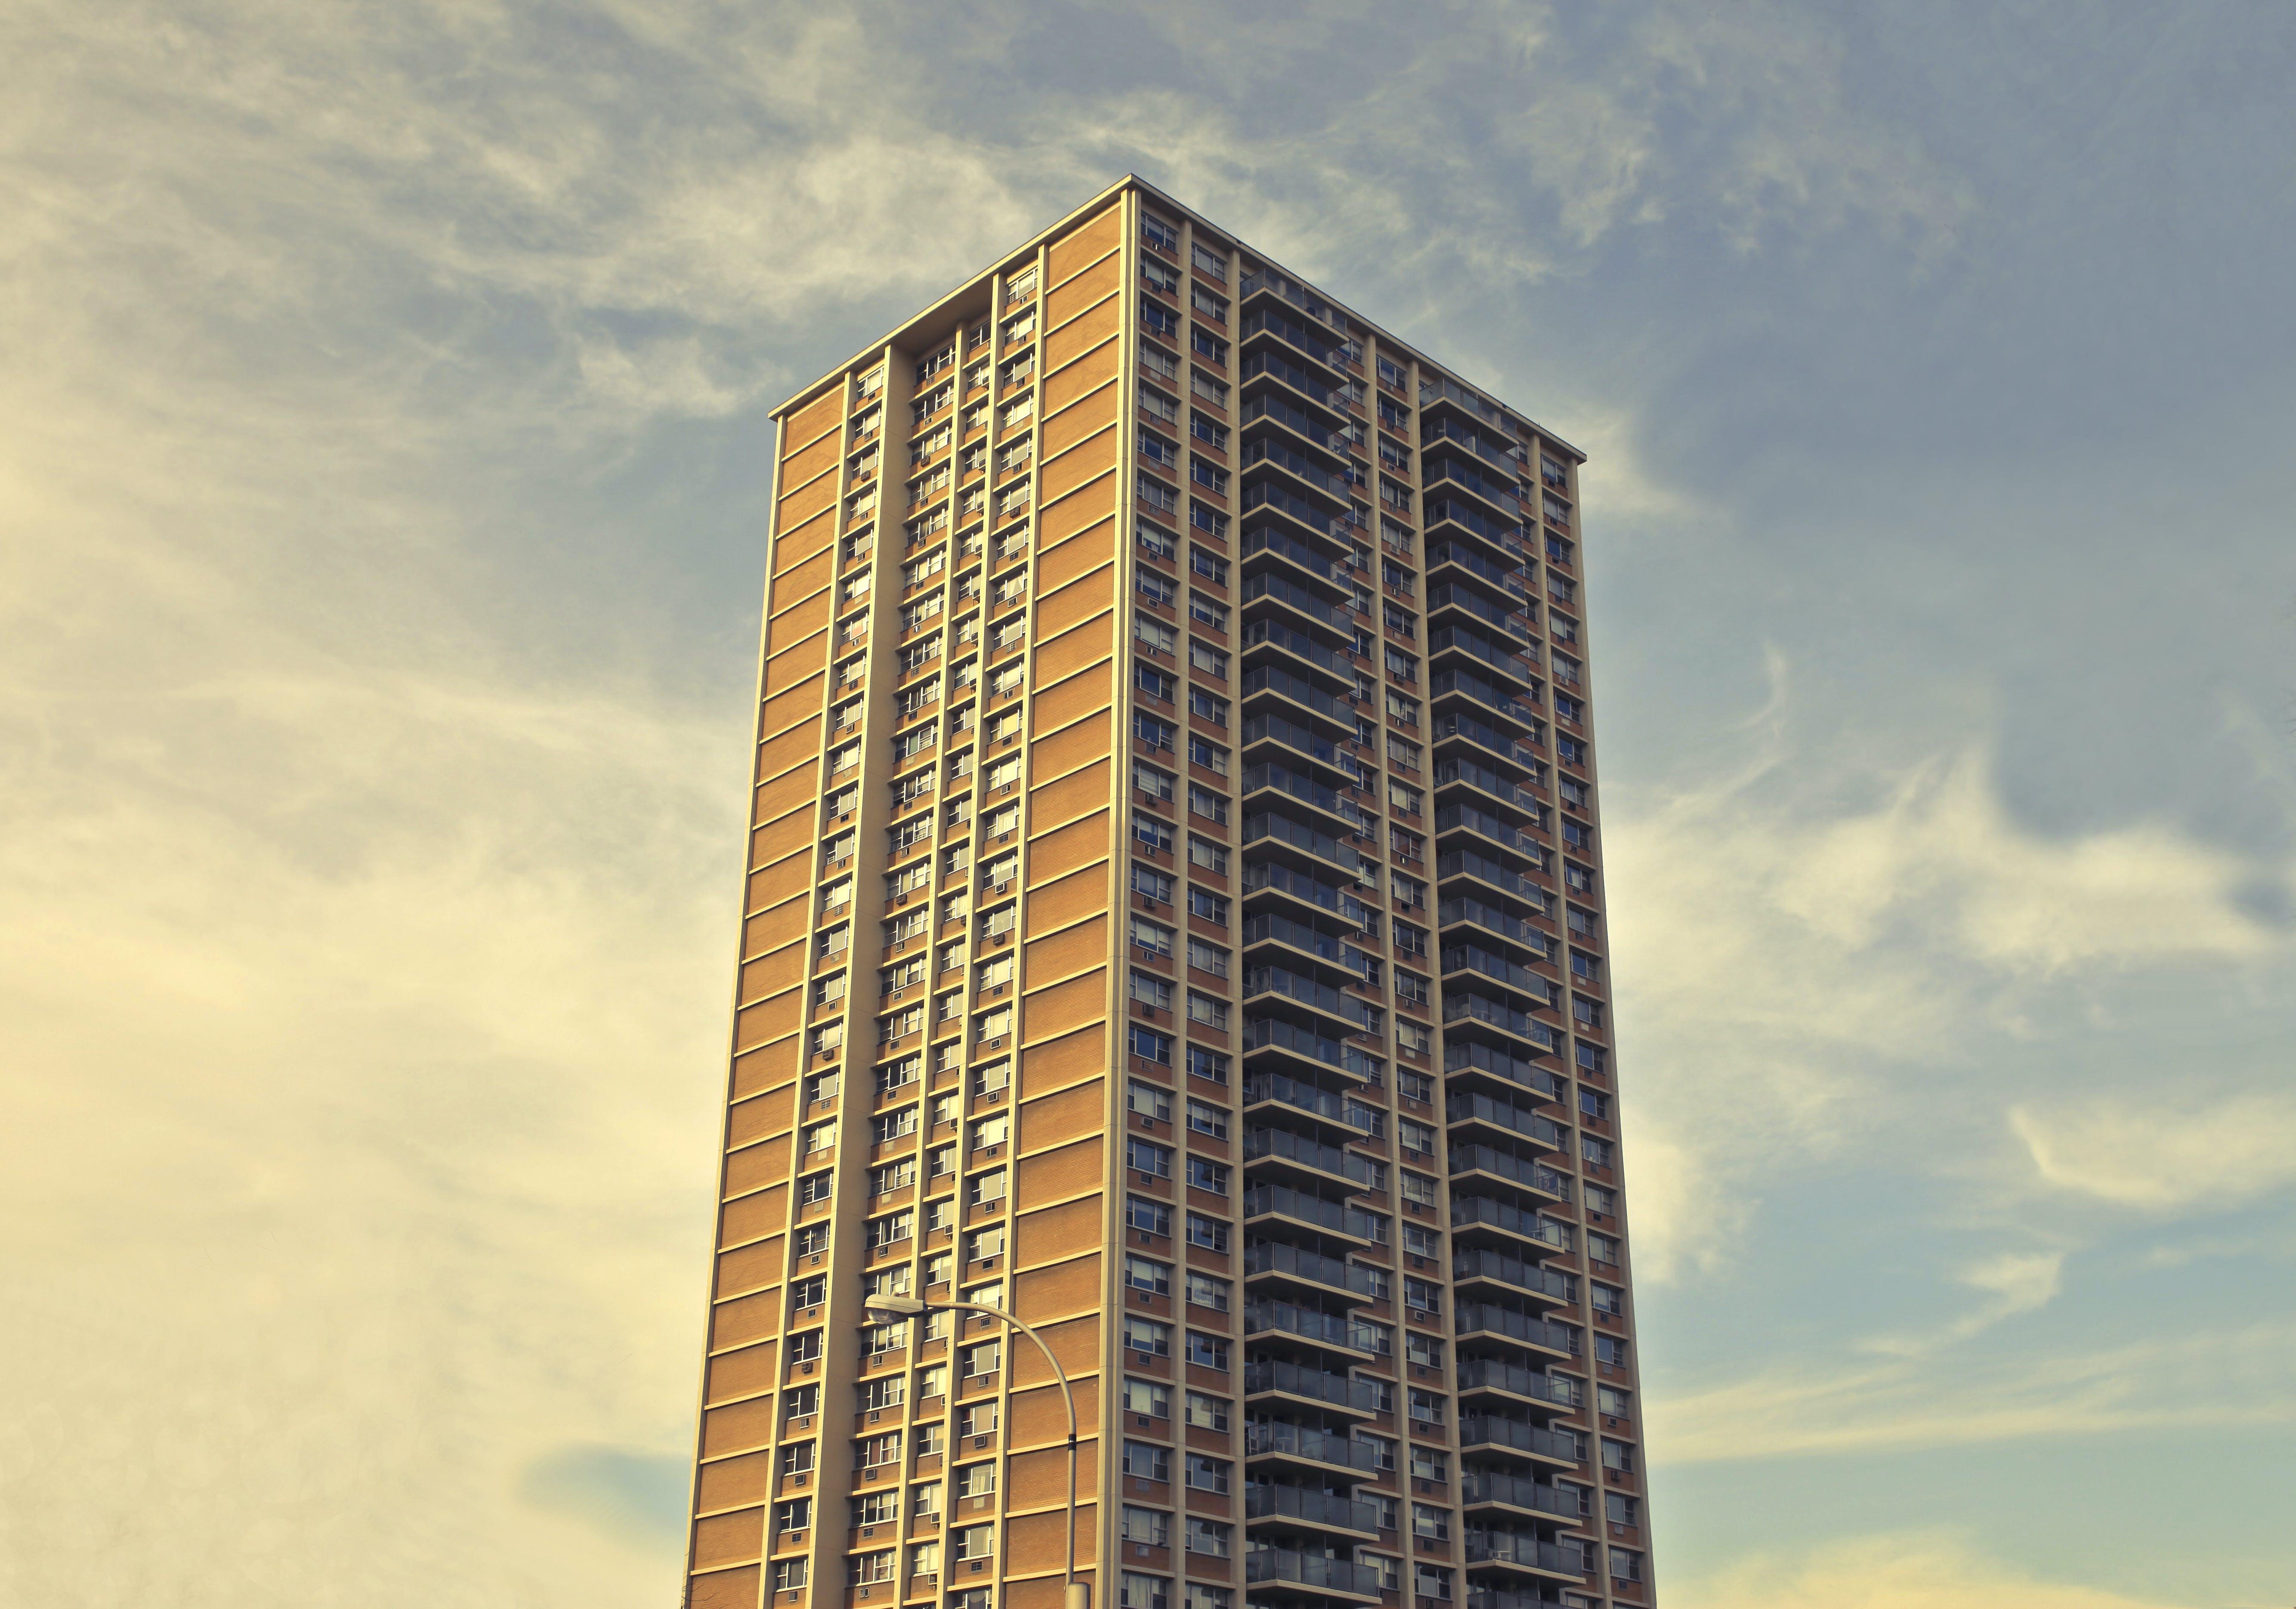 apartmán, architektonický návrh, architektura